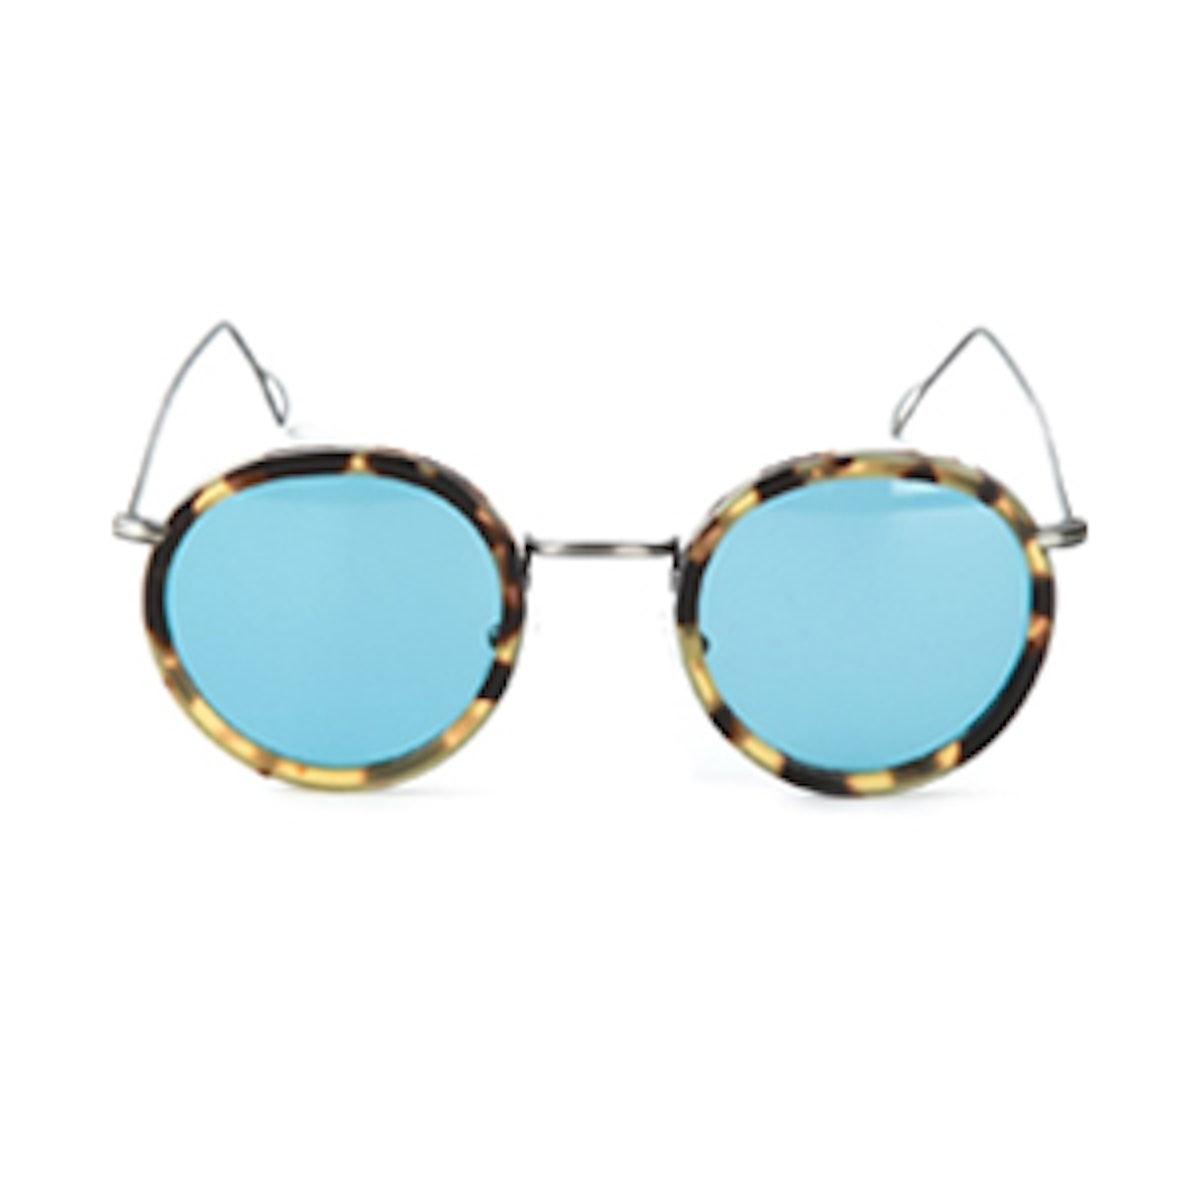 Blue Lense Round Sunglasses